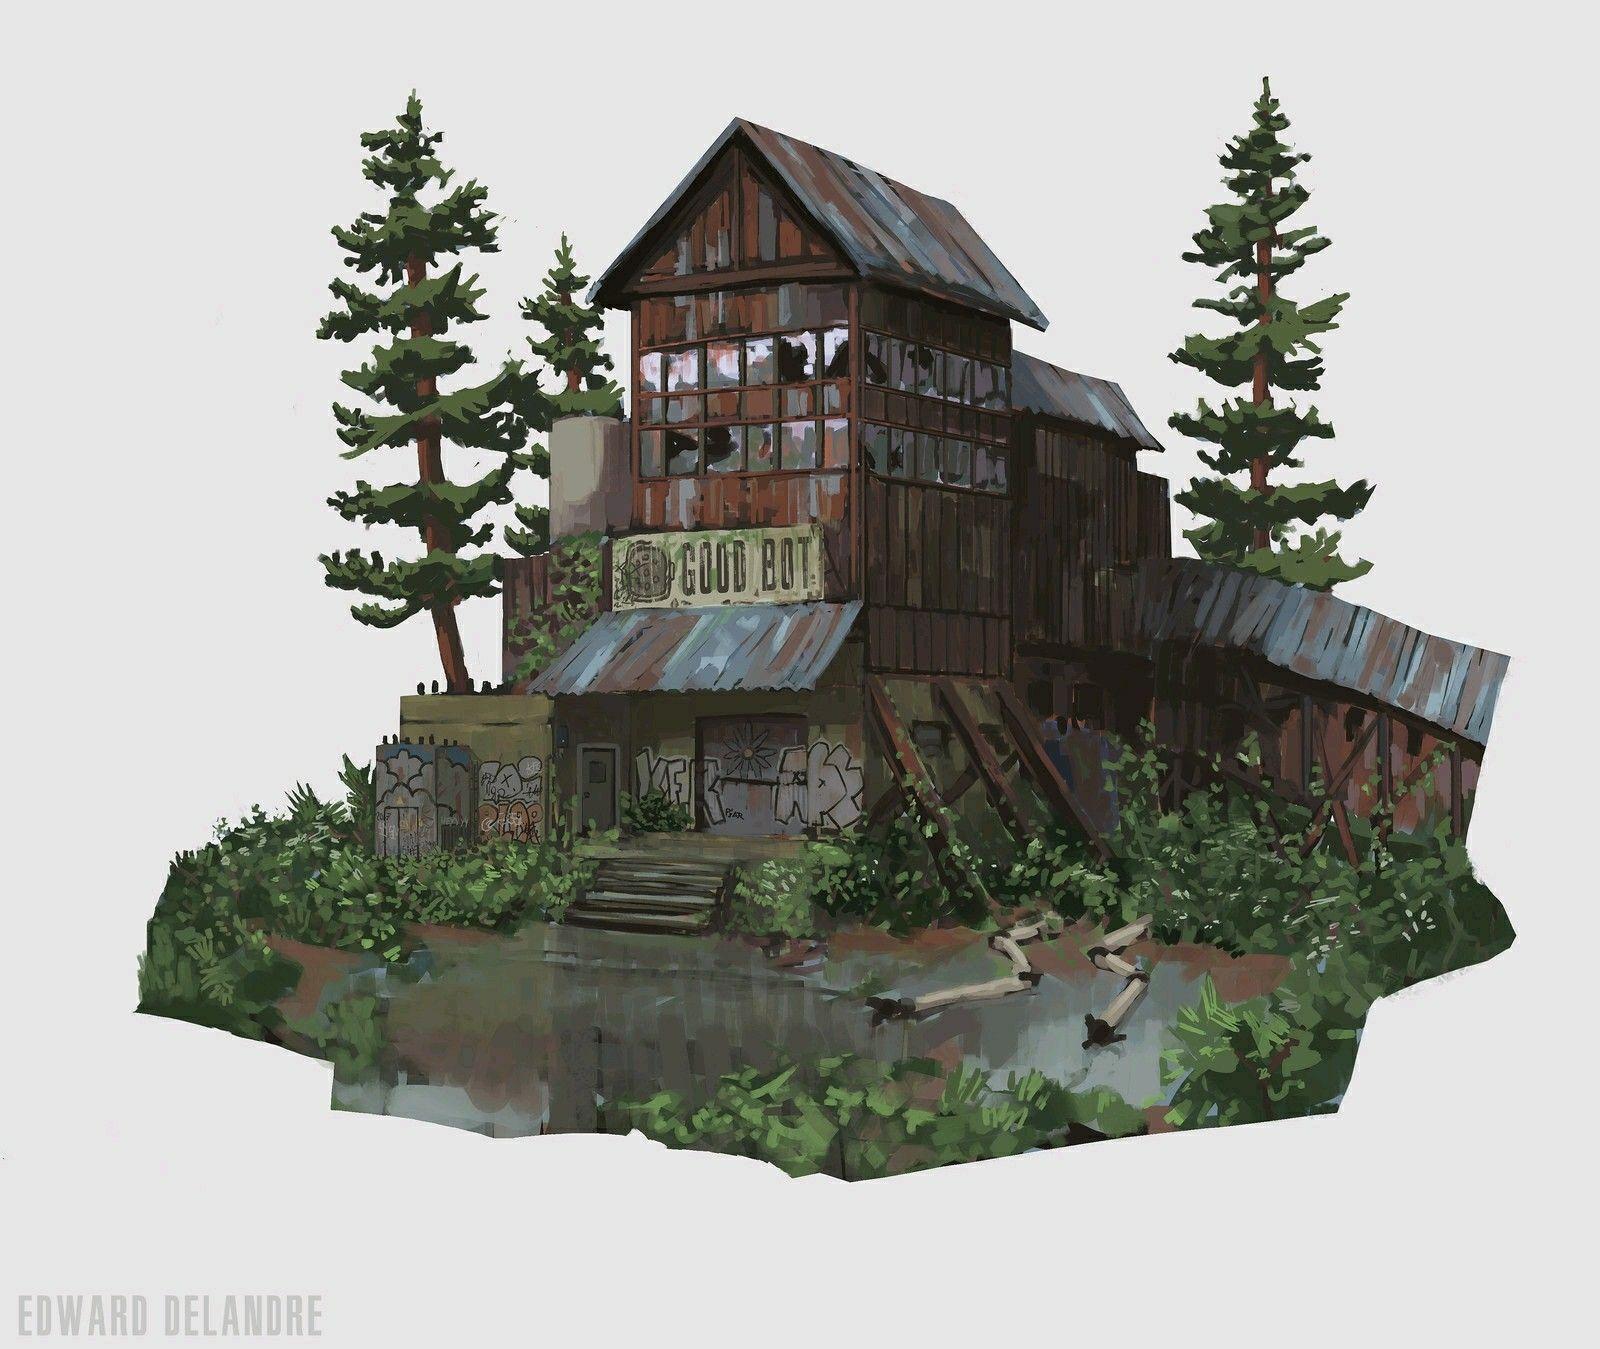 Good Bot and hotel  https://www.artstation.com/p/WbBg3 Edward Delandre Concept artist  - Eugen Systems -- Share via Artstation Android App, Artstation © 2017